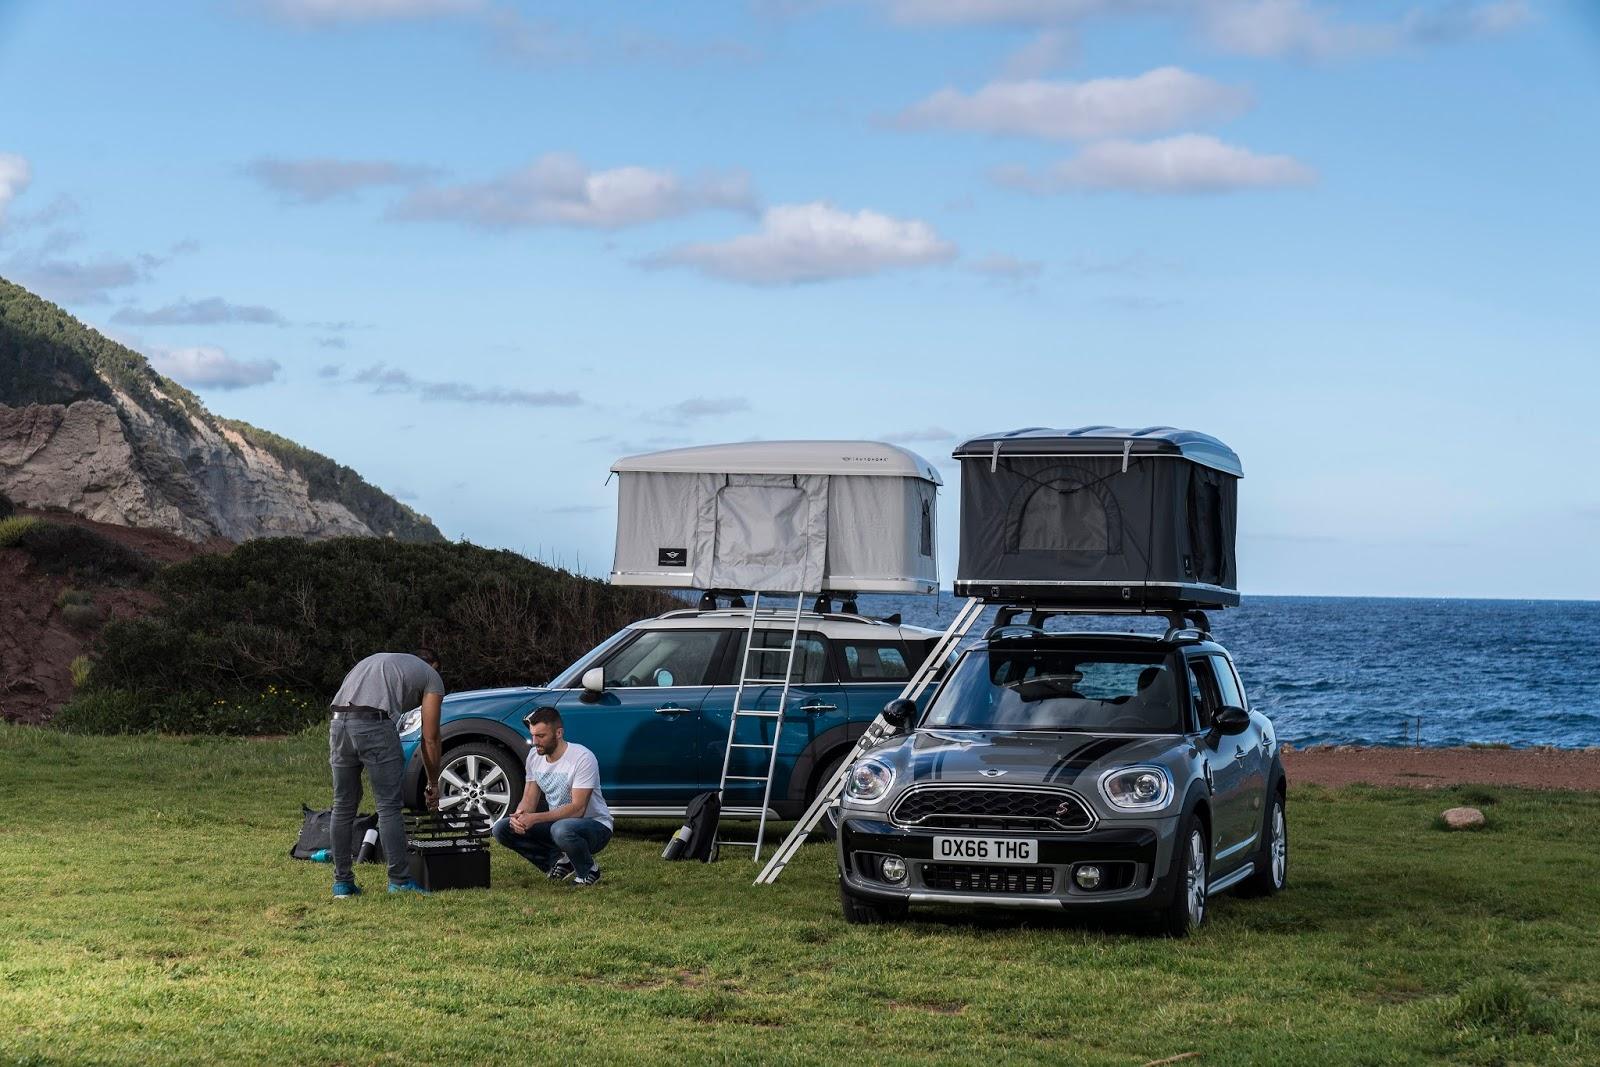 P90258003 highRes the autohome roof te Το MINI Countryman έχει και... σκηνή οροφής Mini, MINI Cooper Countryman, SUV